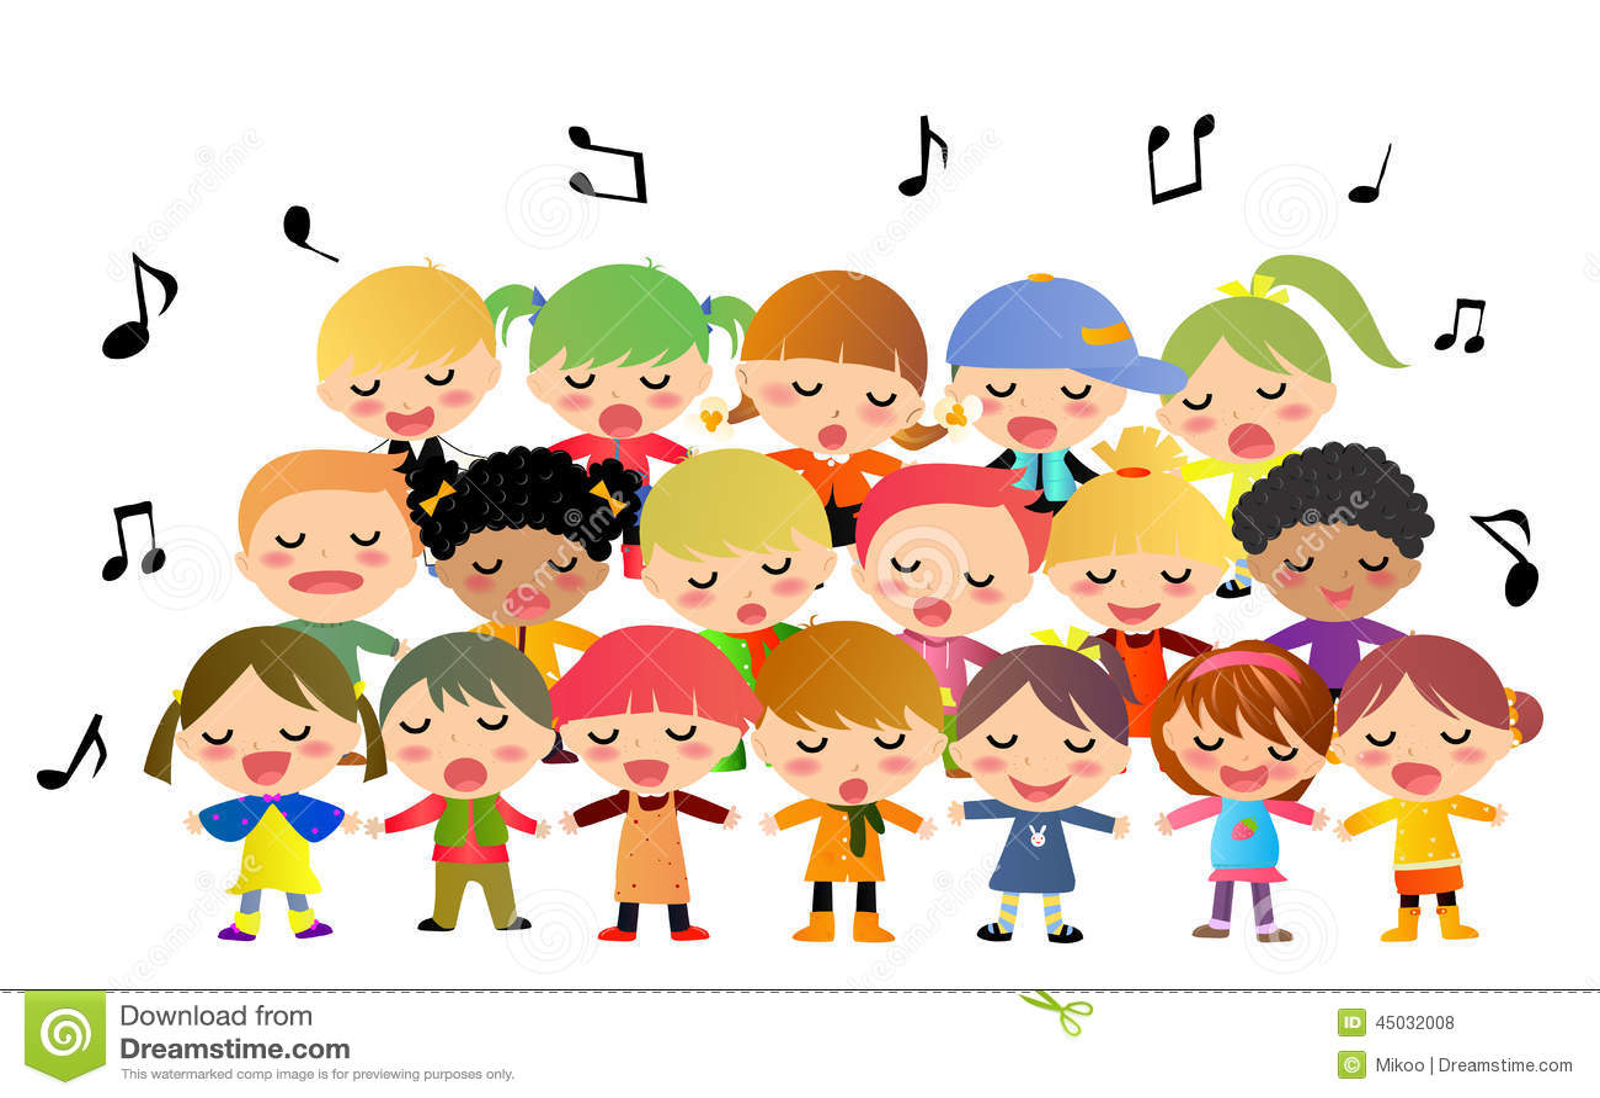 Children Choir Singing Stock Vector - Image: 45032008